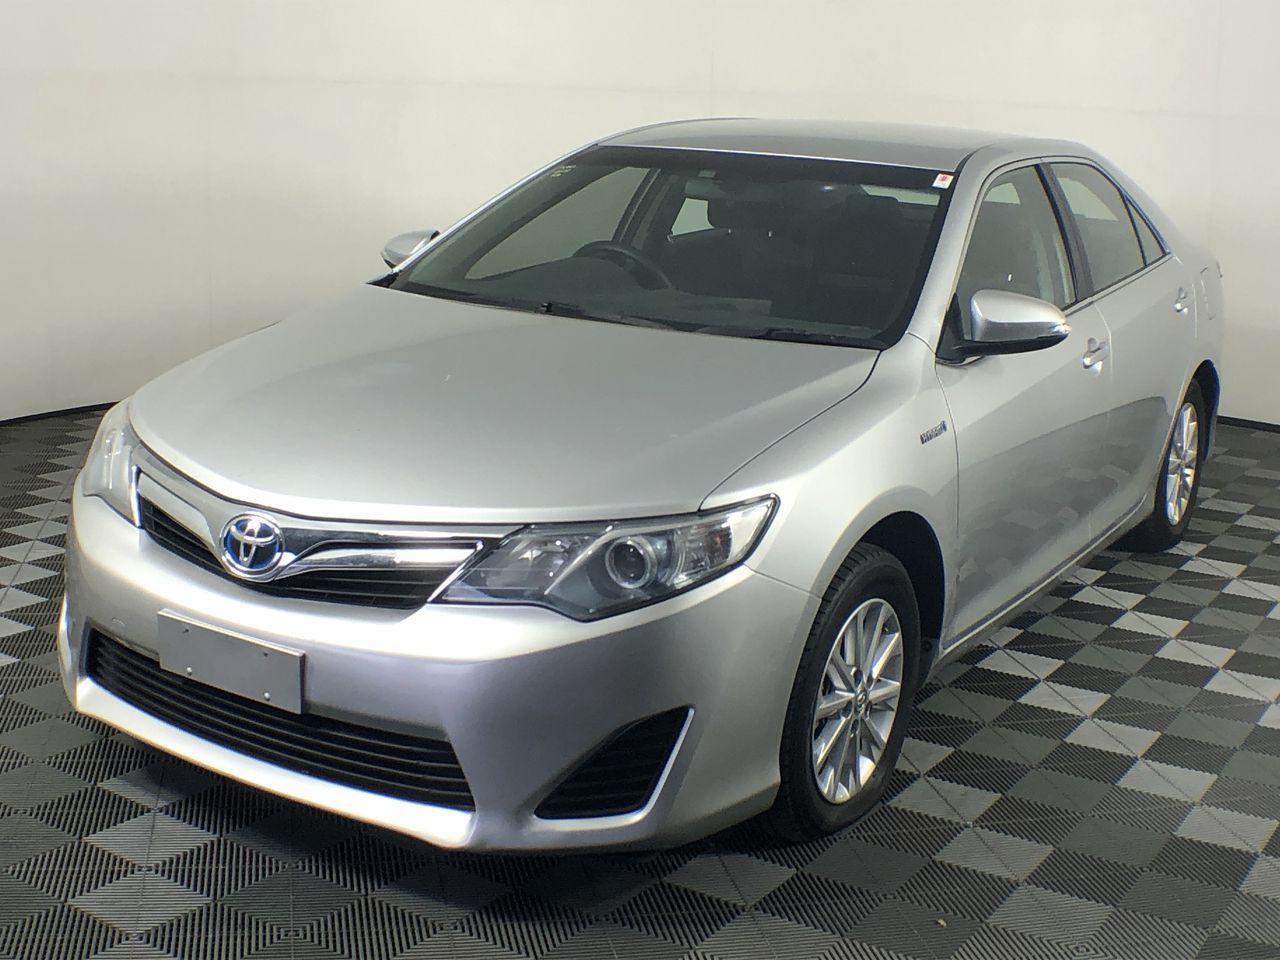 2013 Toyota Camry Hybrid H AVV50R CVT Sedan(WOVR)